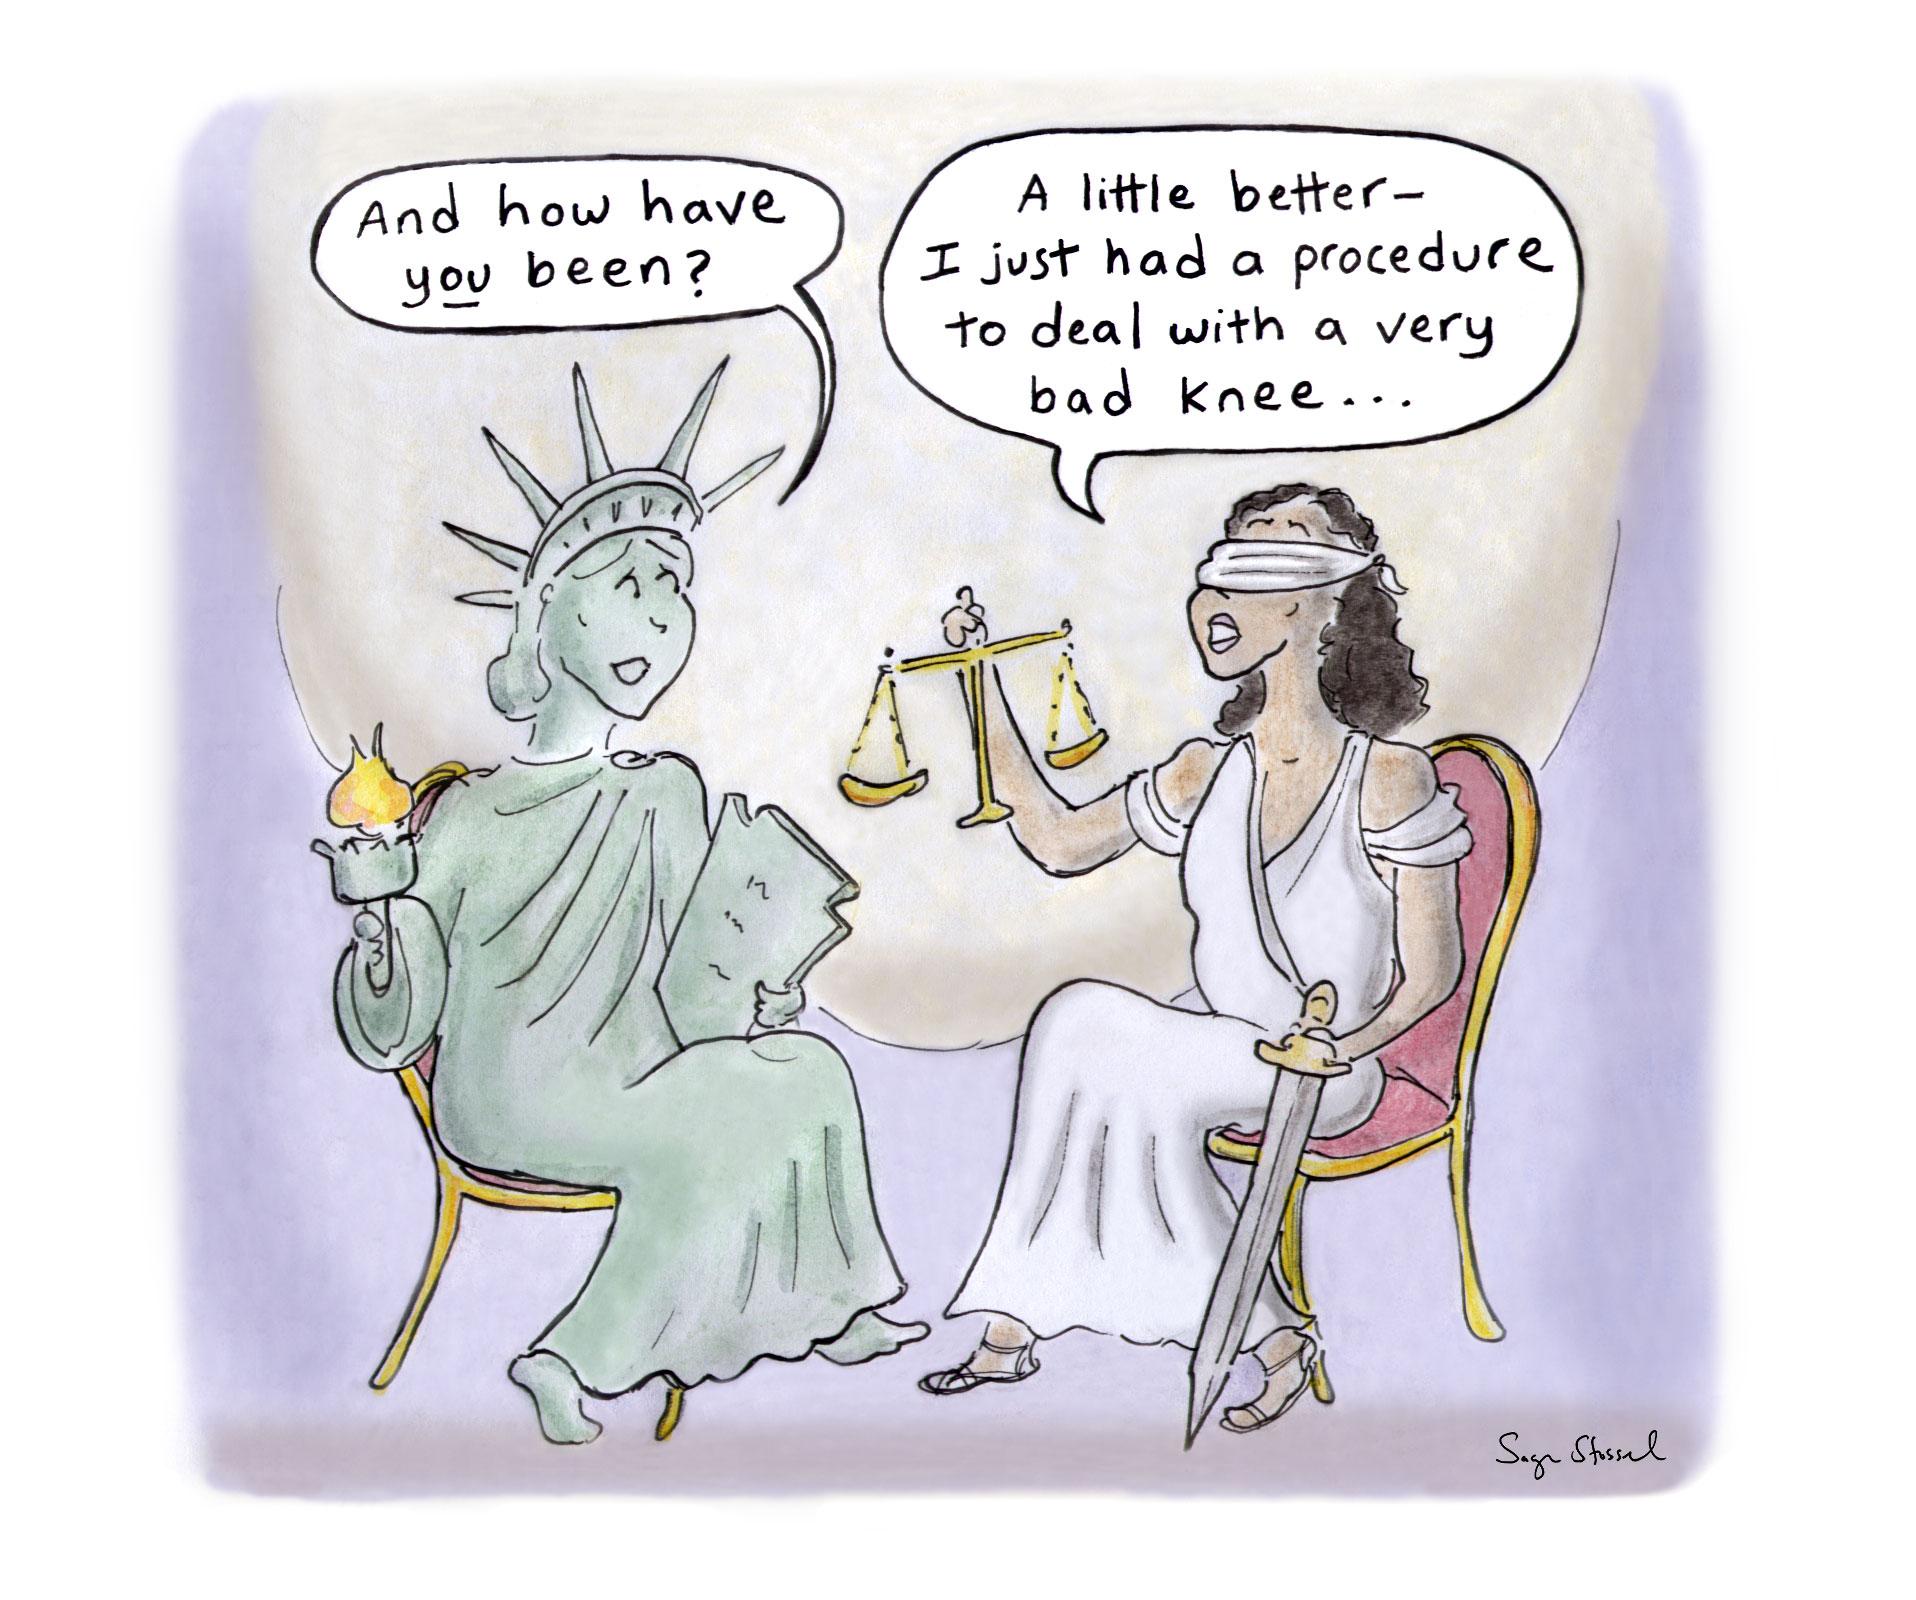 george floyd, justice, derek chauvin, police reform, race, cartoon, sage stossel